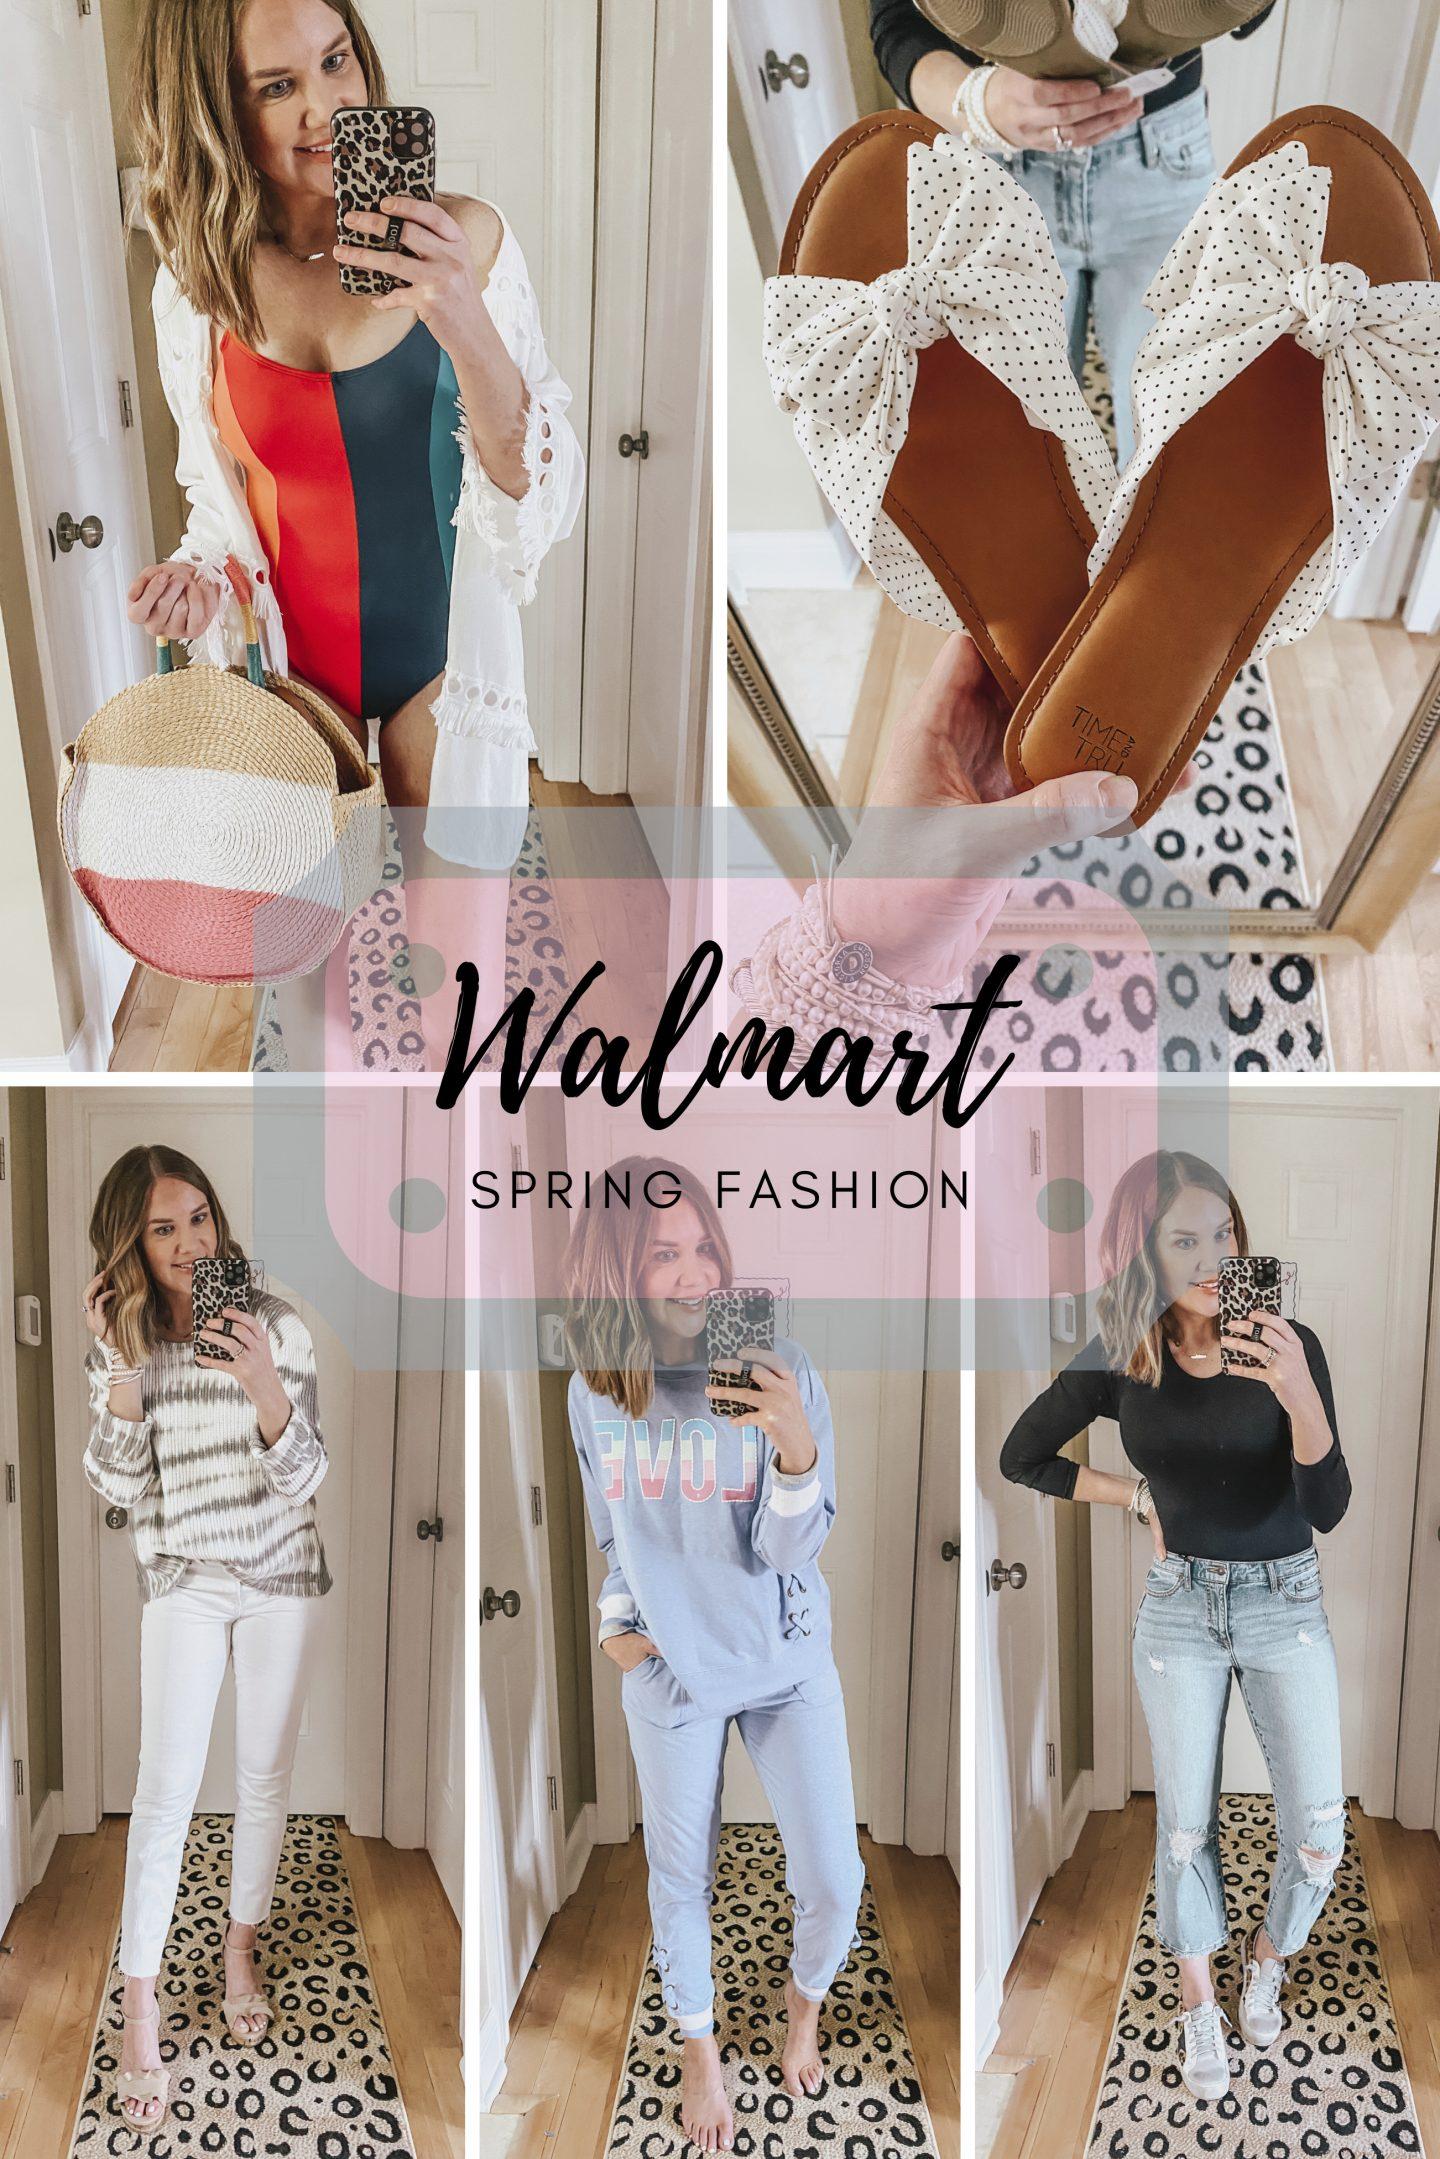 Walmart spring fashion, 2020 fashion trends, Walmart fashion lines